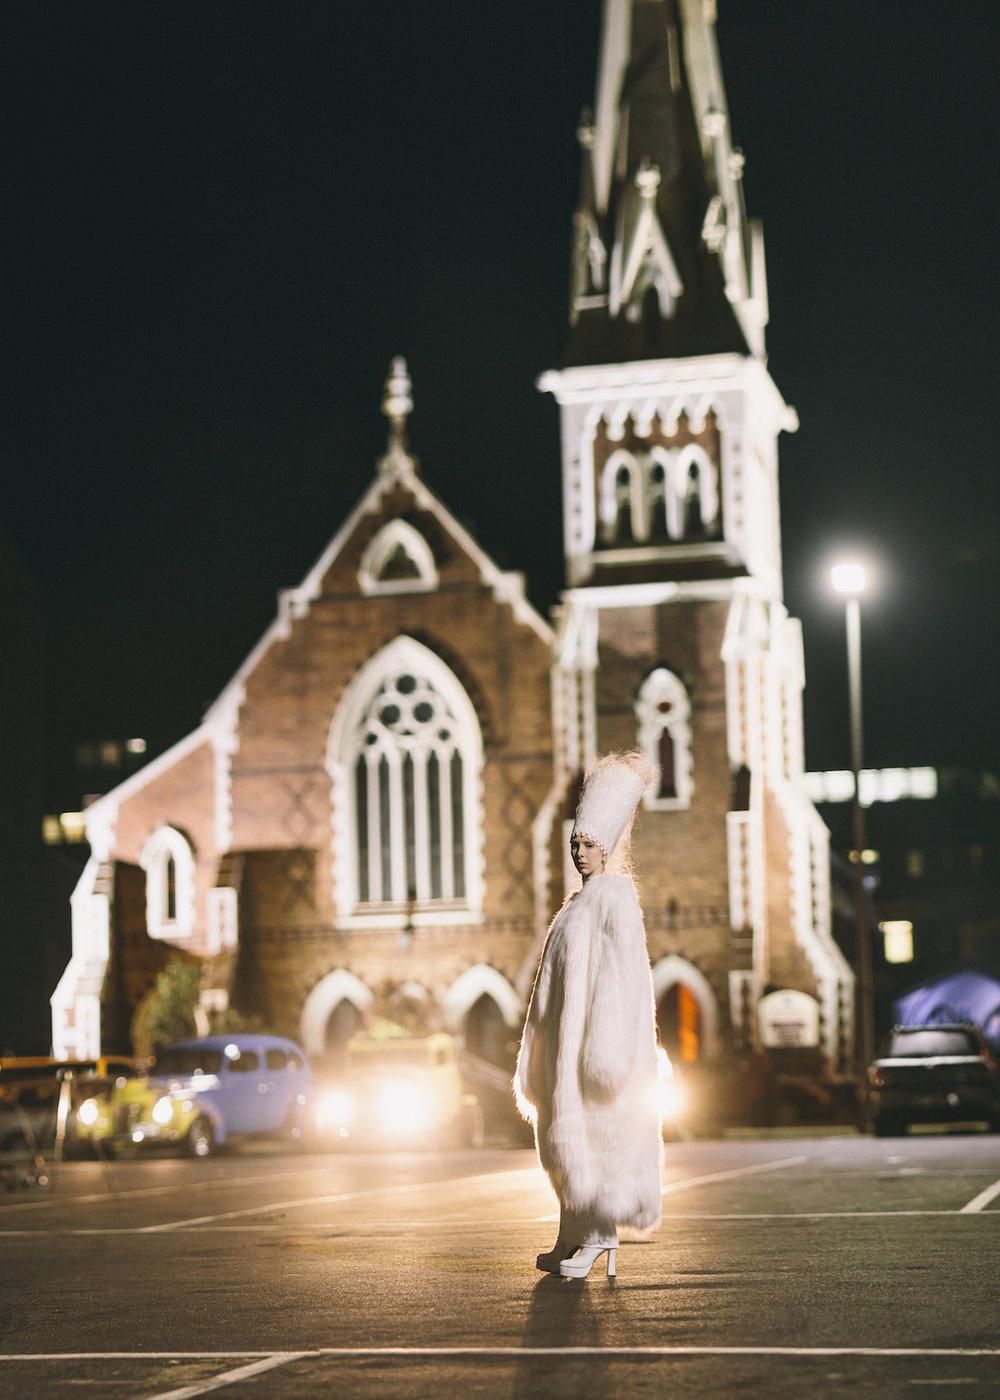 Crossing 4 - Jessie French - Pilgrim Uniting Church - UnconsciousCollective - DarkMofo:LusyProductions2017 - Image Courtesy Dark Mofo, Hobart, Tasmania, Australia copy.jpg